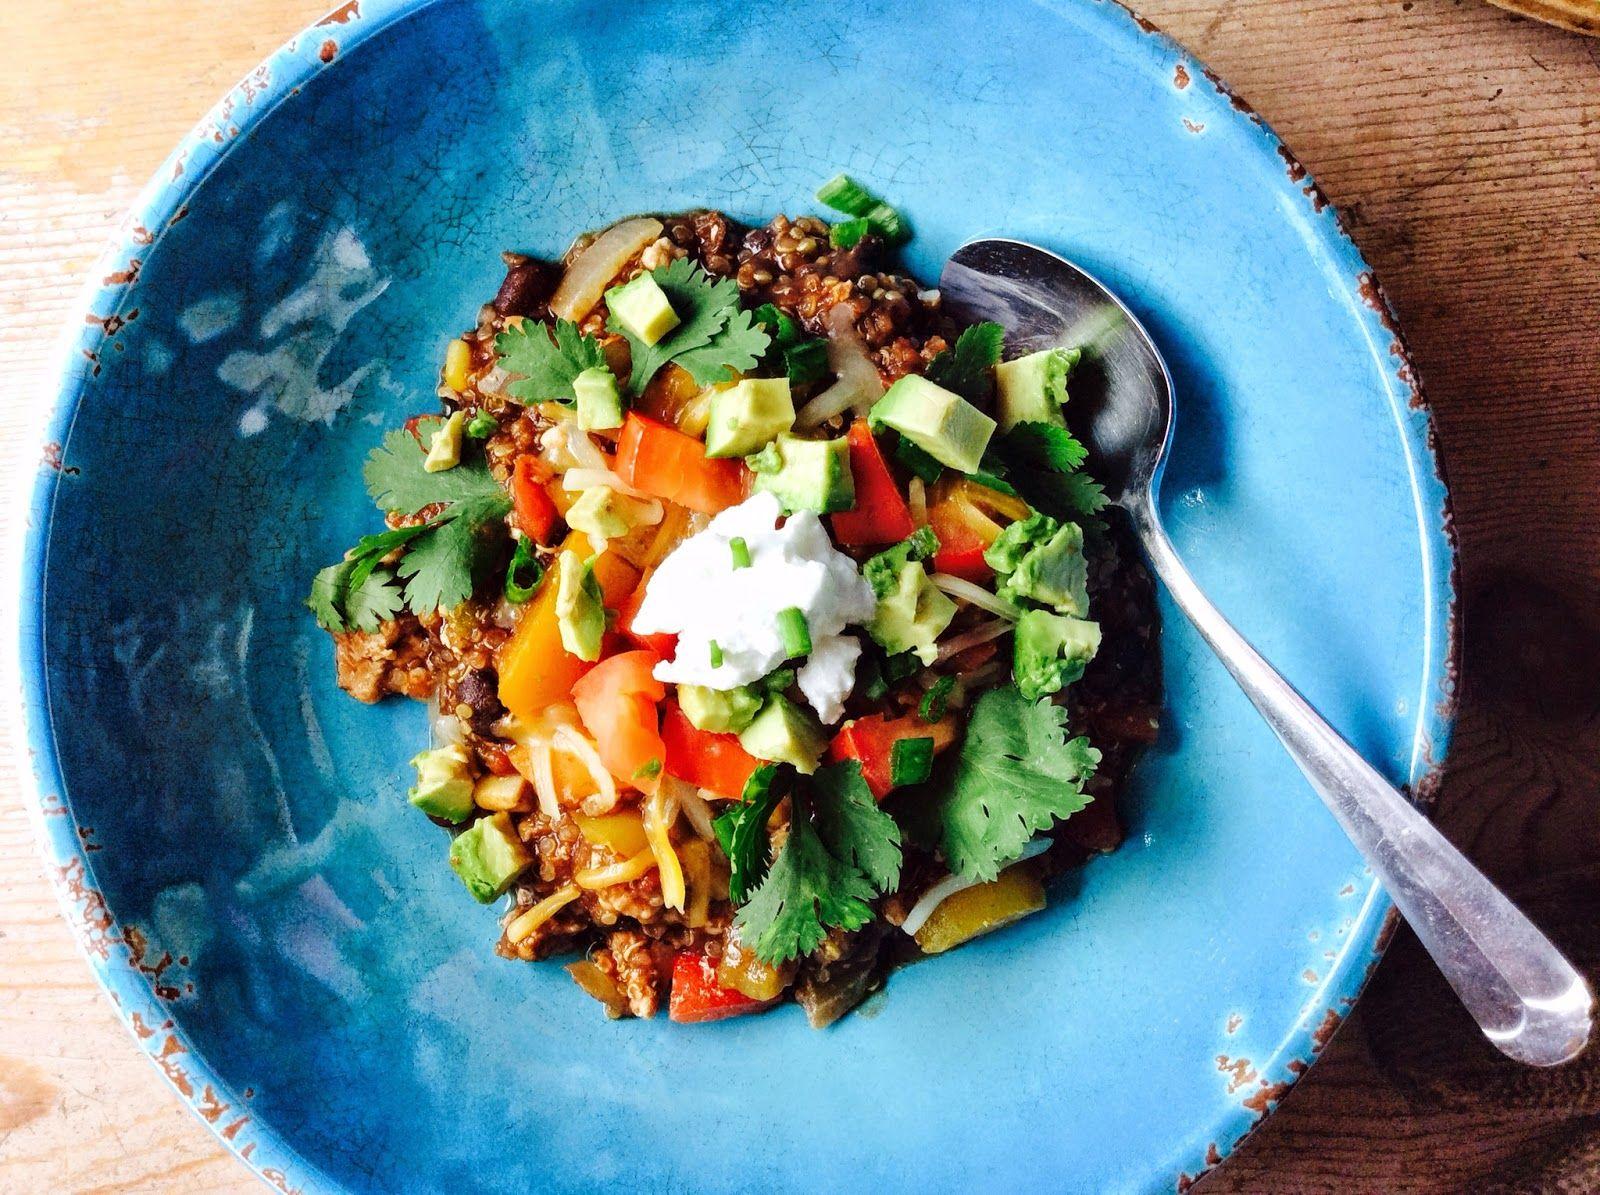 Food Fitness by Paige: Turkey Mole' Quinoa Chili